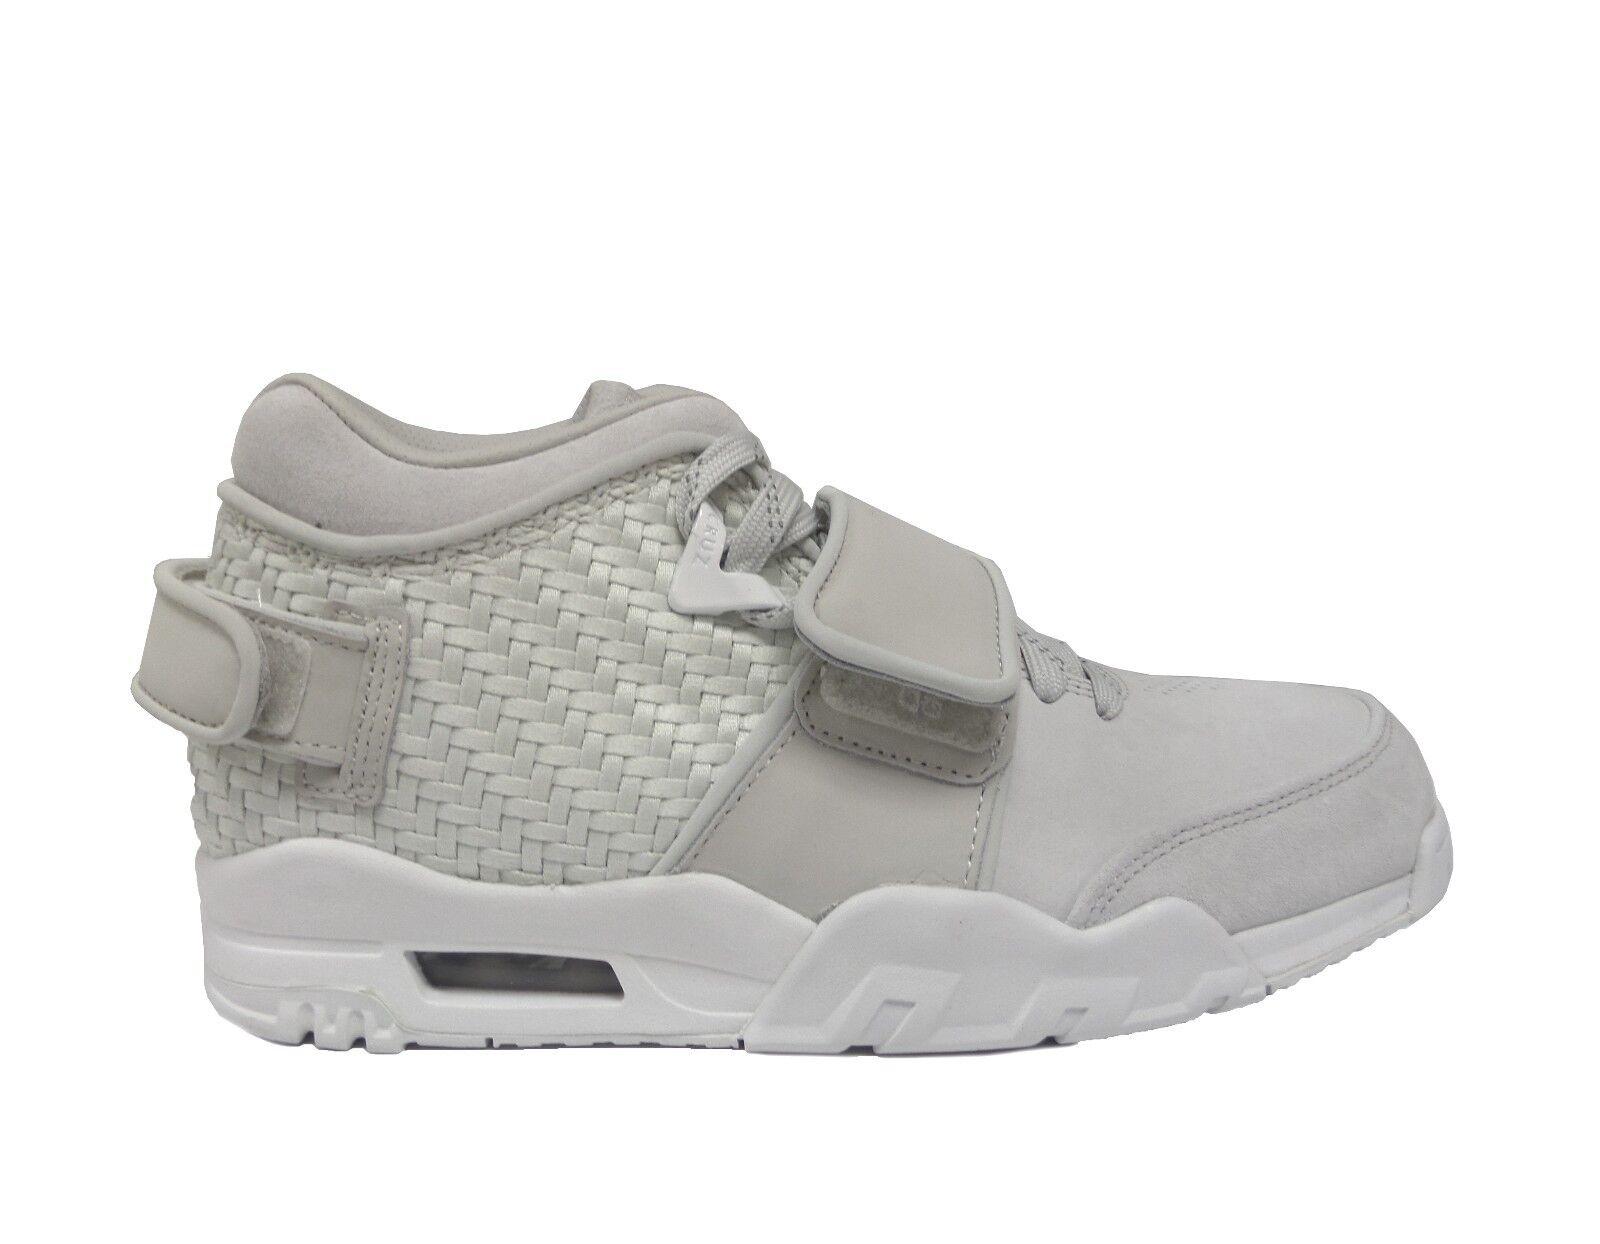 Nike Men's AIR TRAINER CRUZ LIGHT BONE Shoes 777535-003 a